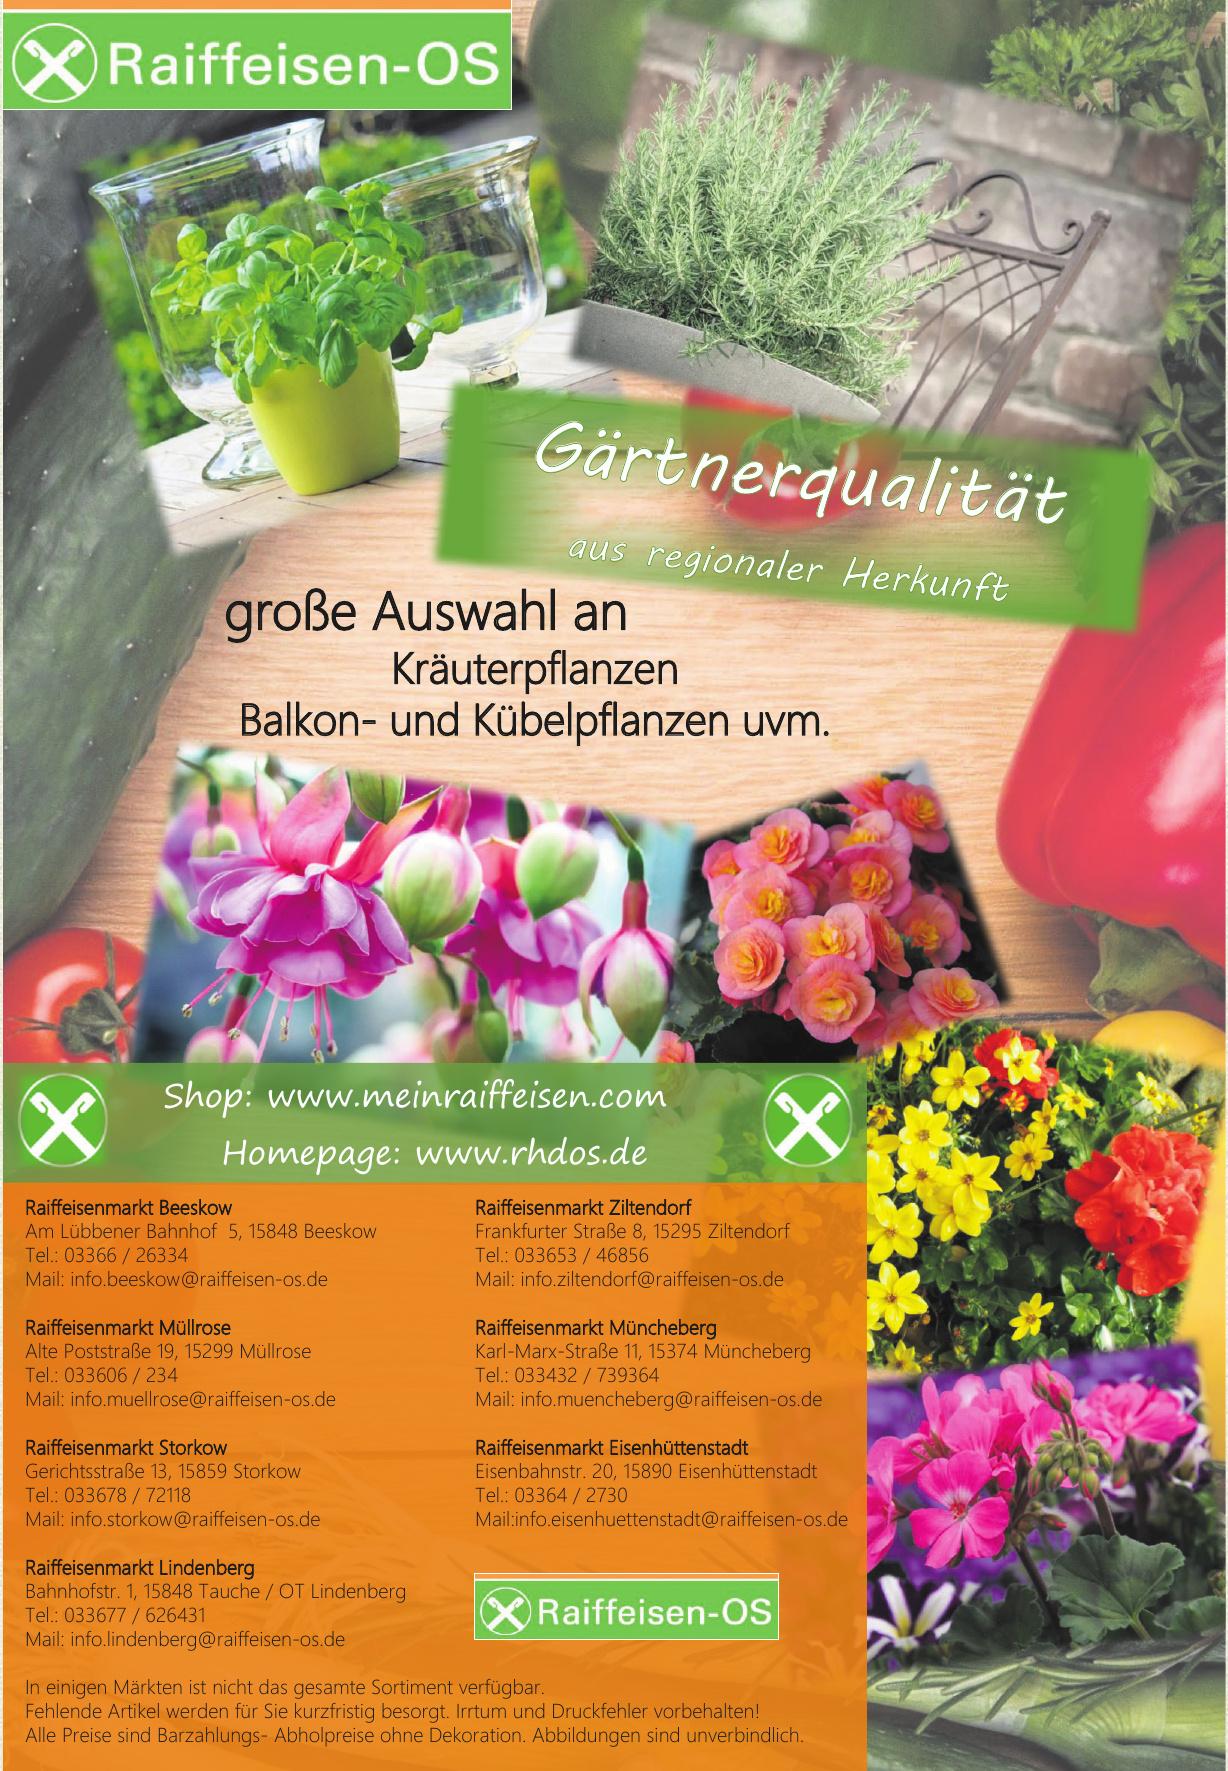 Raiffeisen- OS Raiffeisenmarkt Beeskow